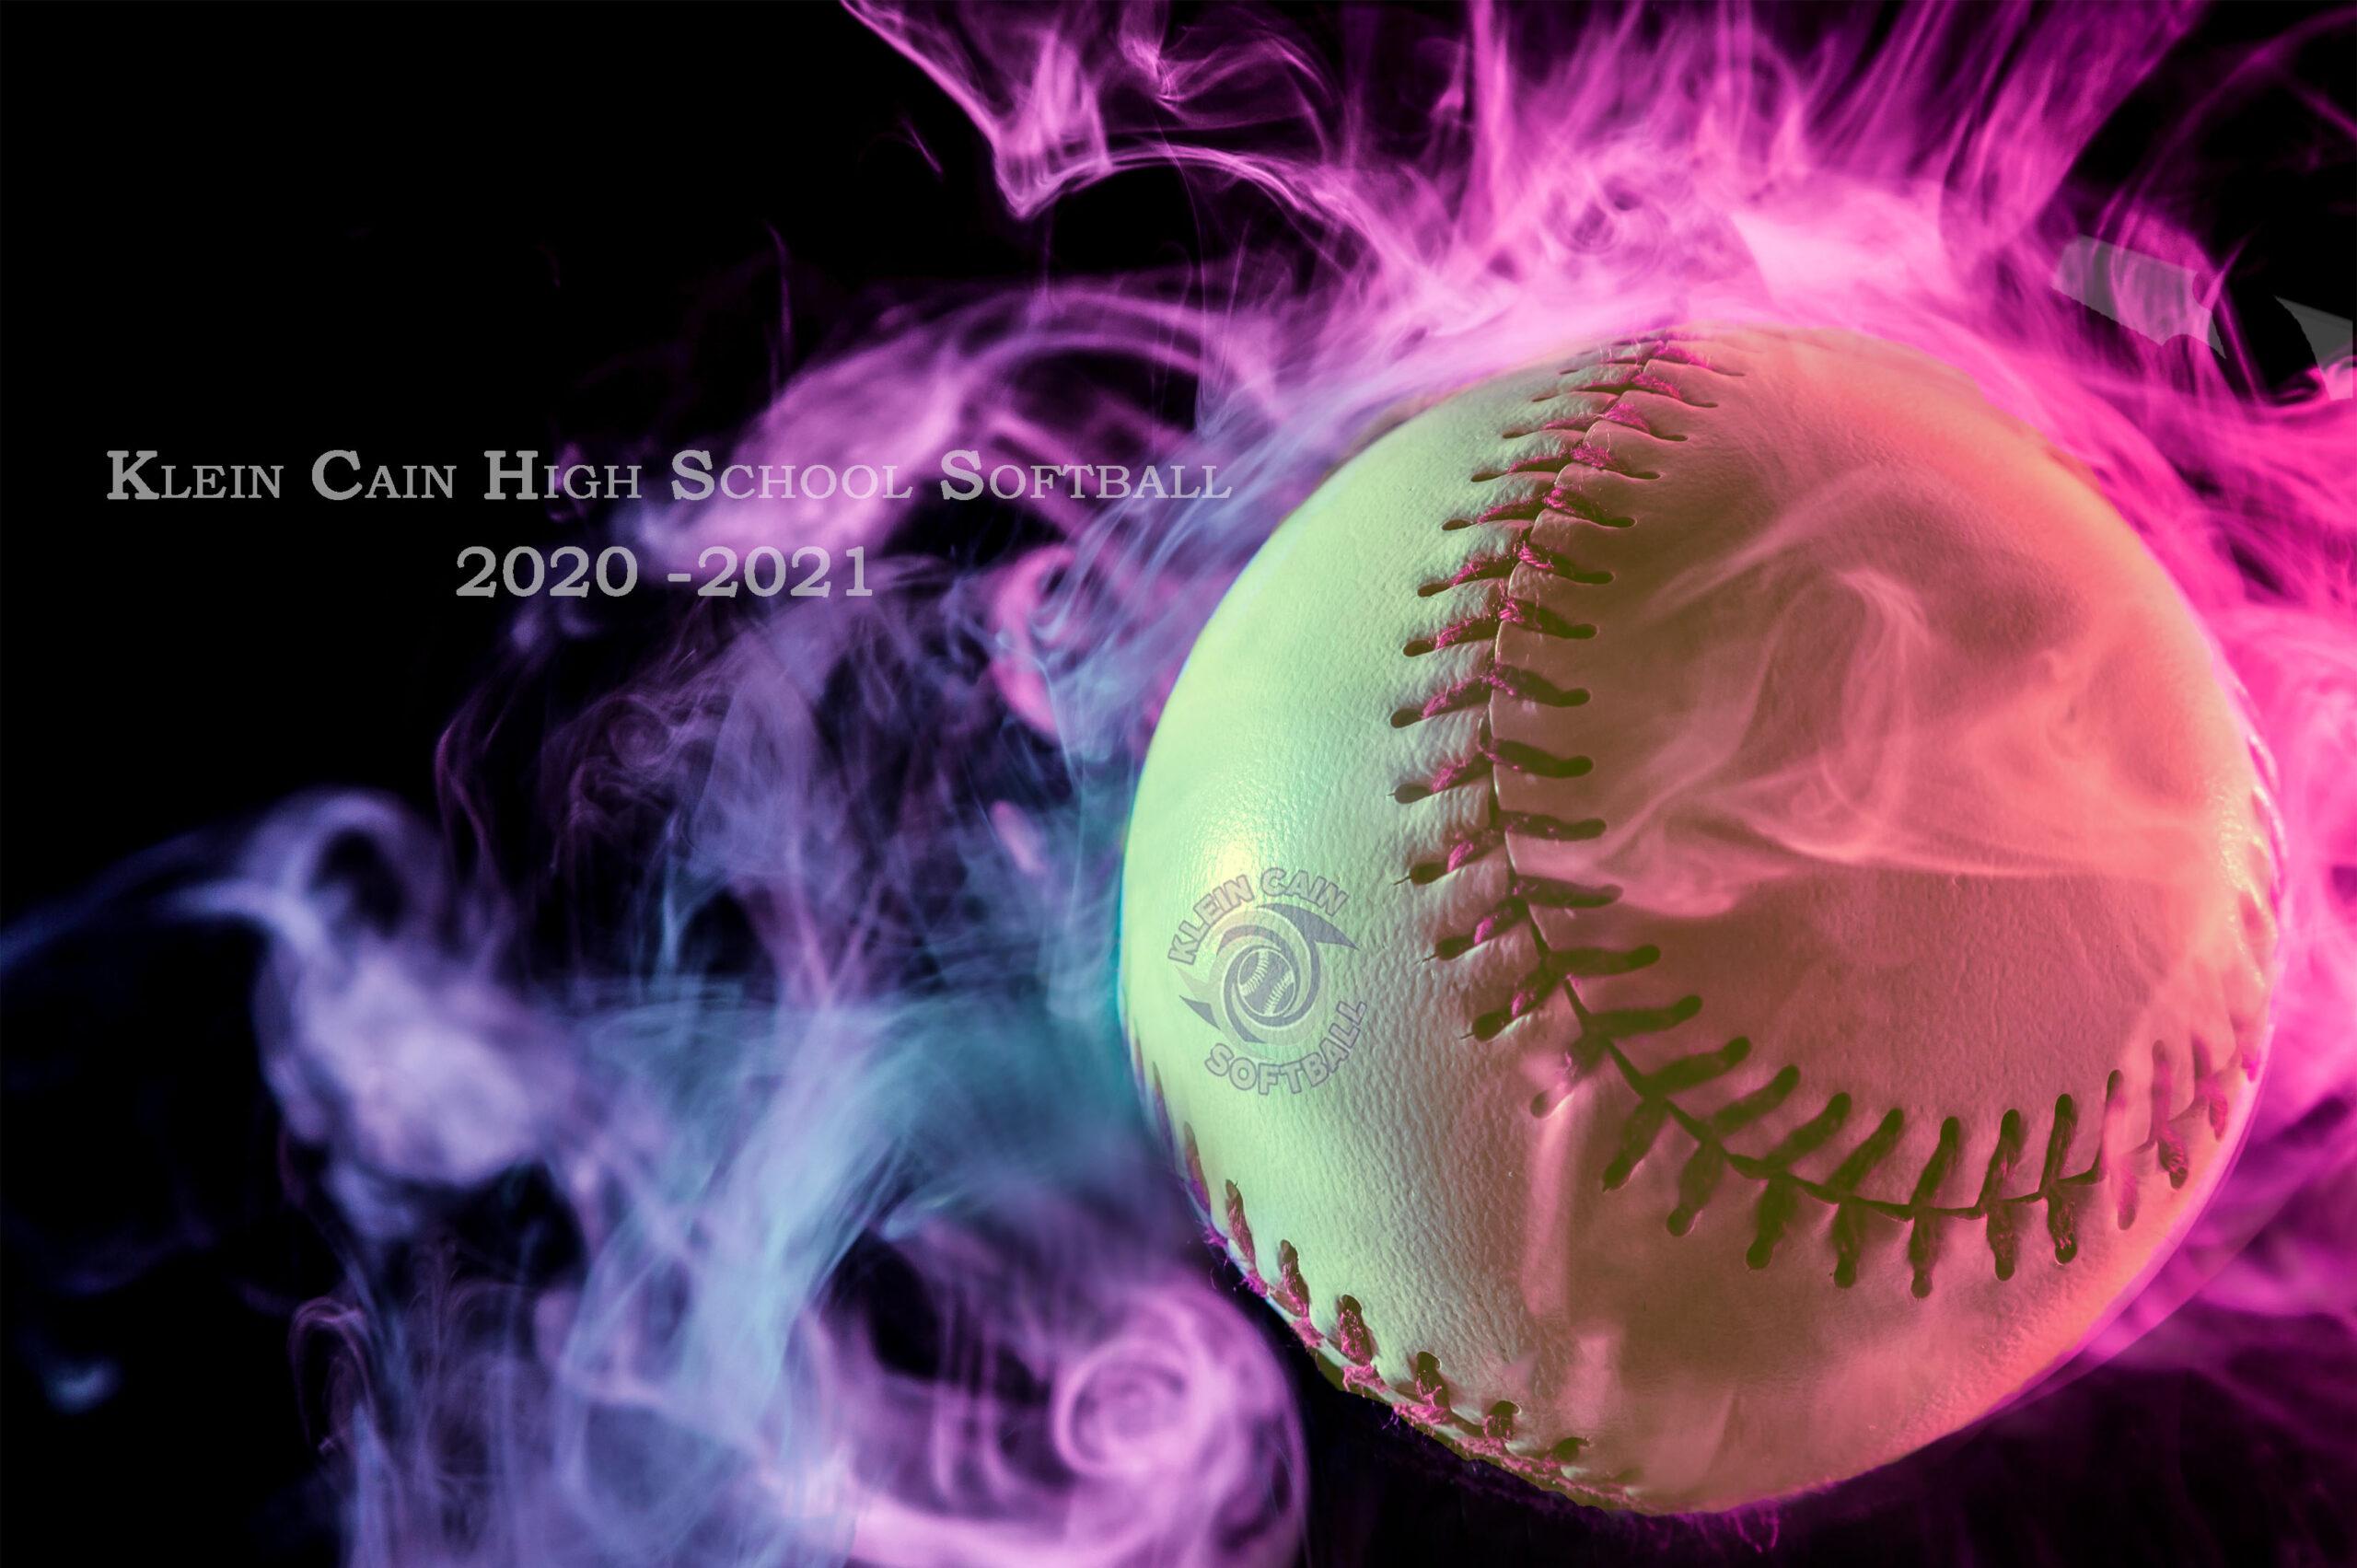 KC Softball purple image